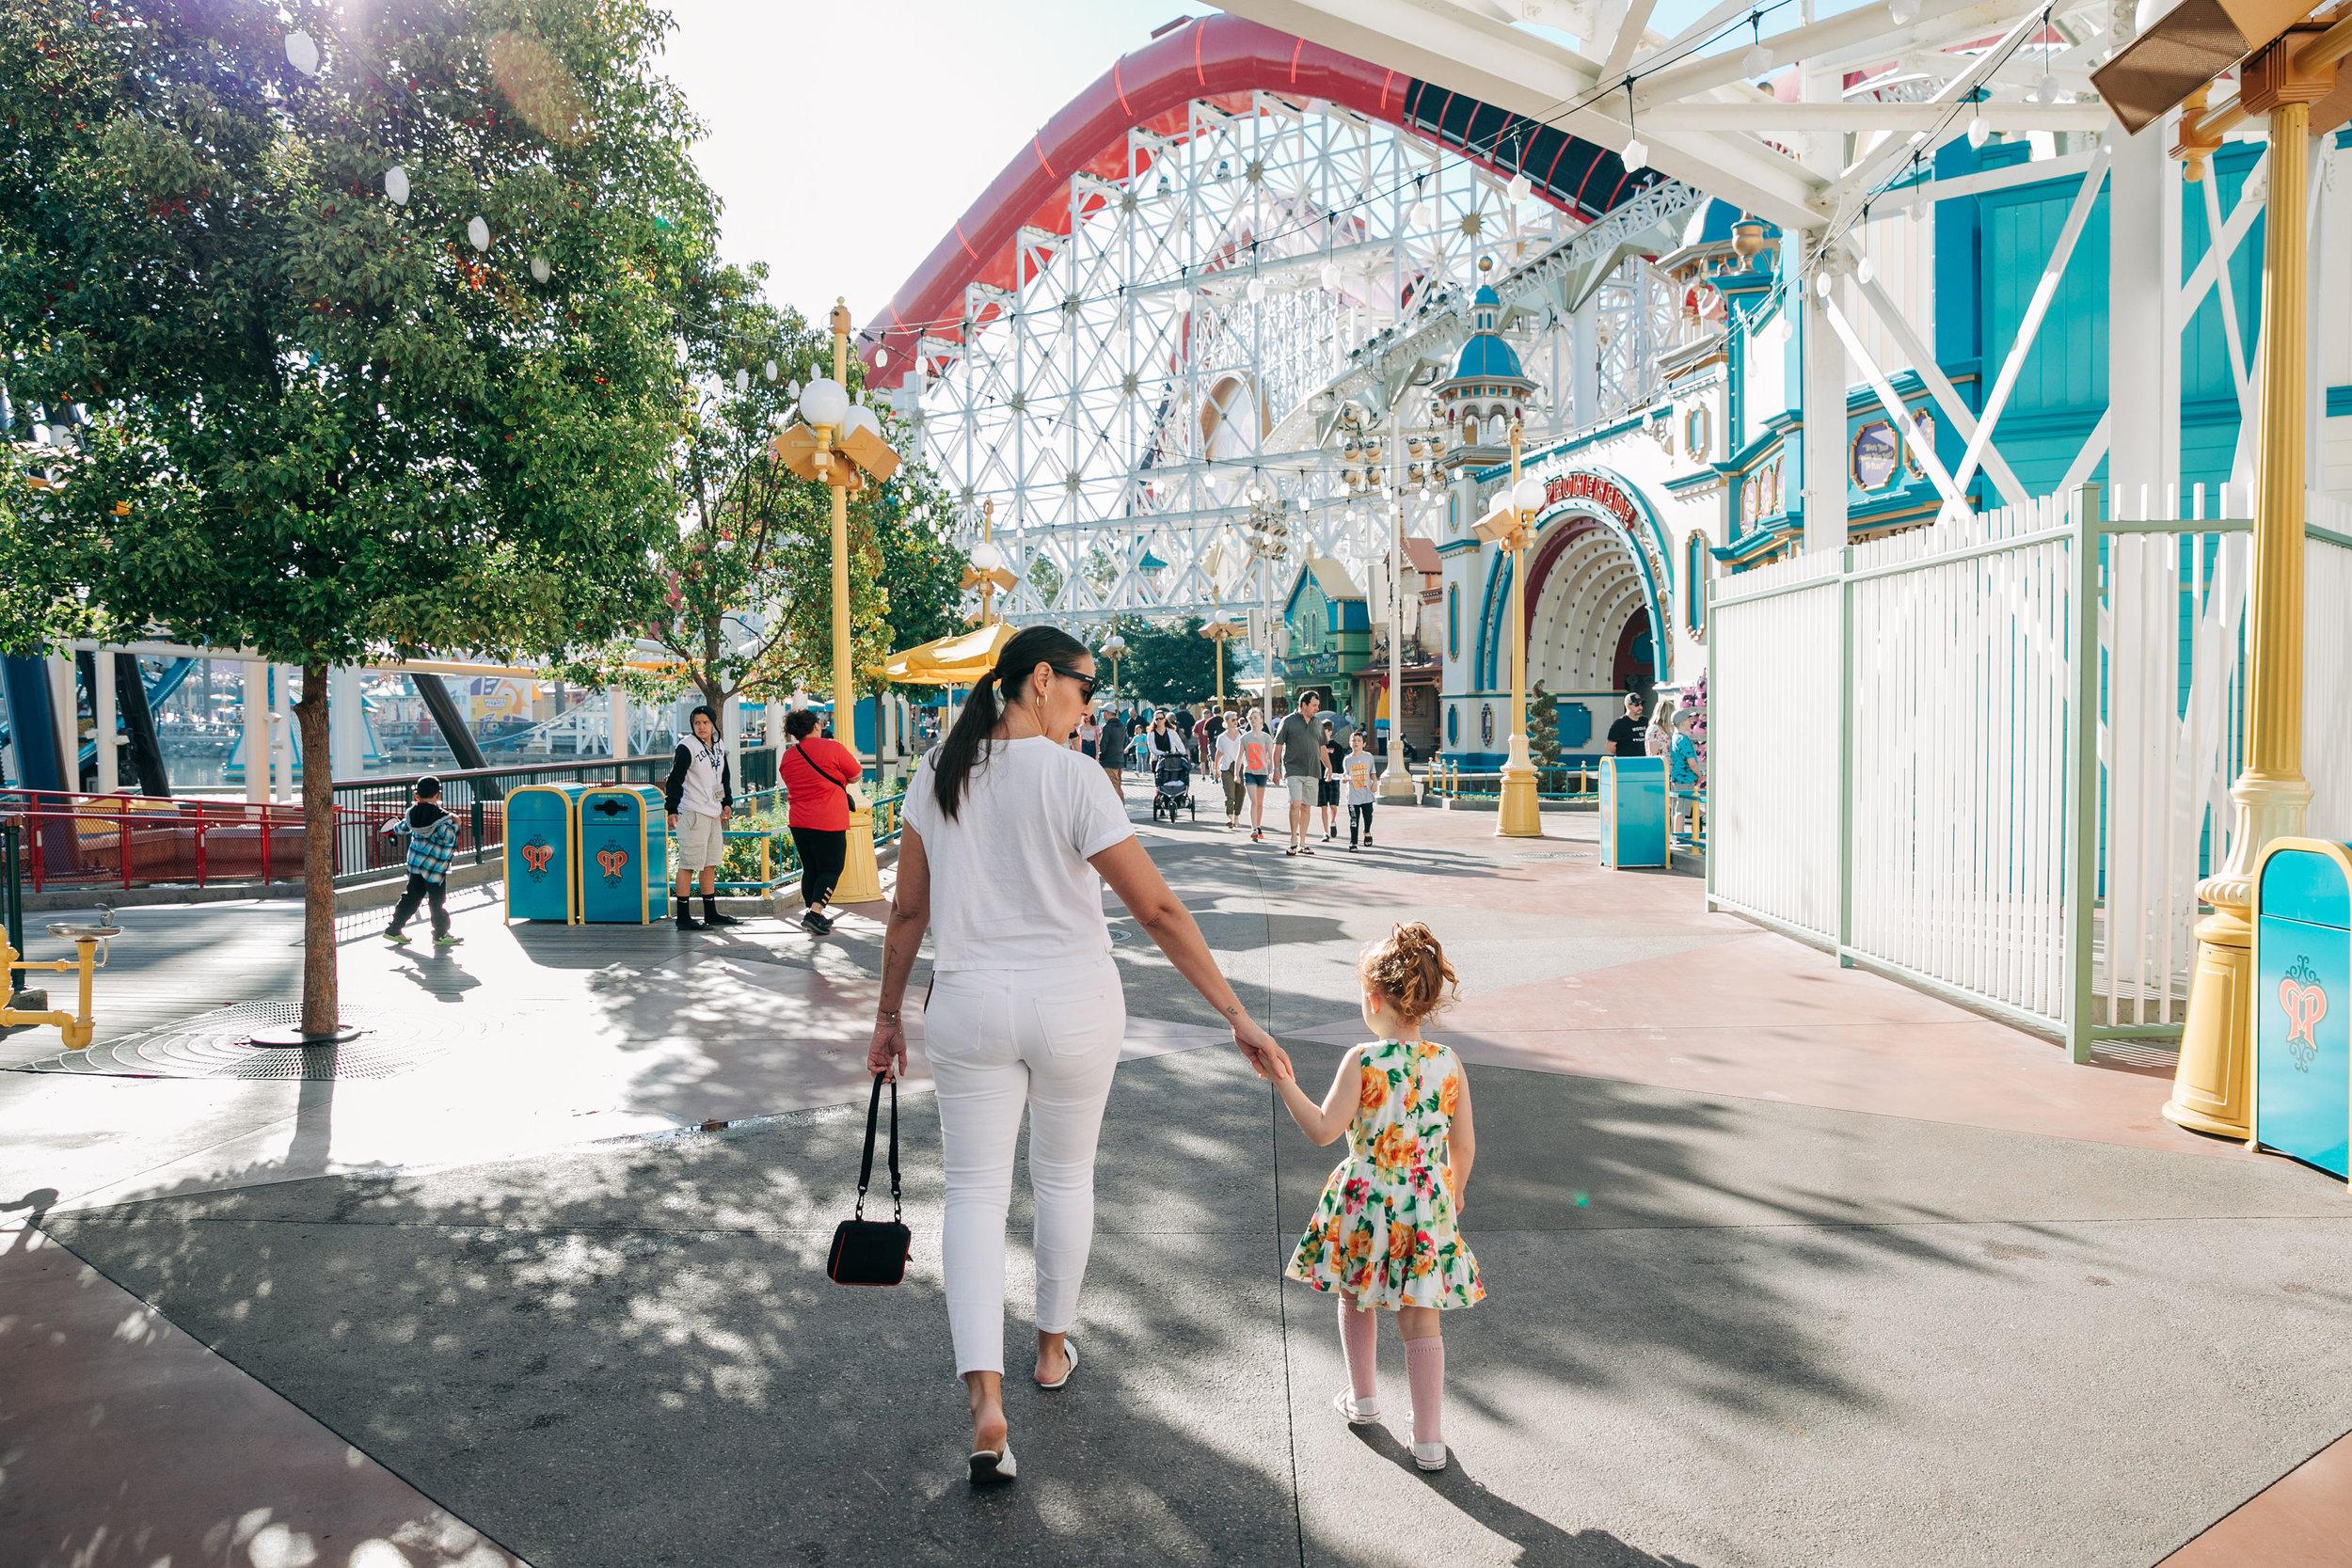 Disney_California_Adventure_LilyRoPhotography-13.jpg